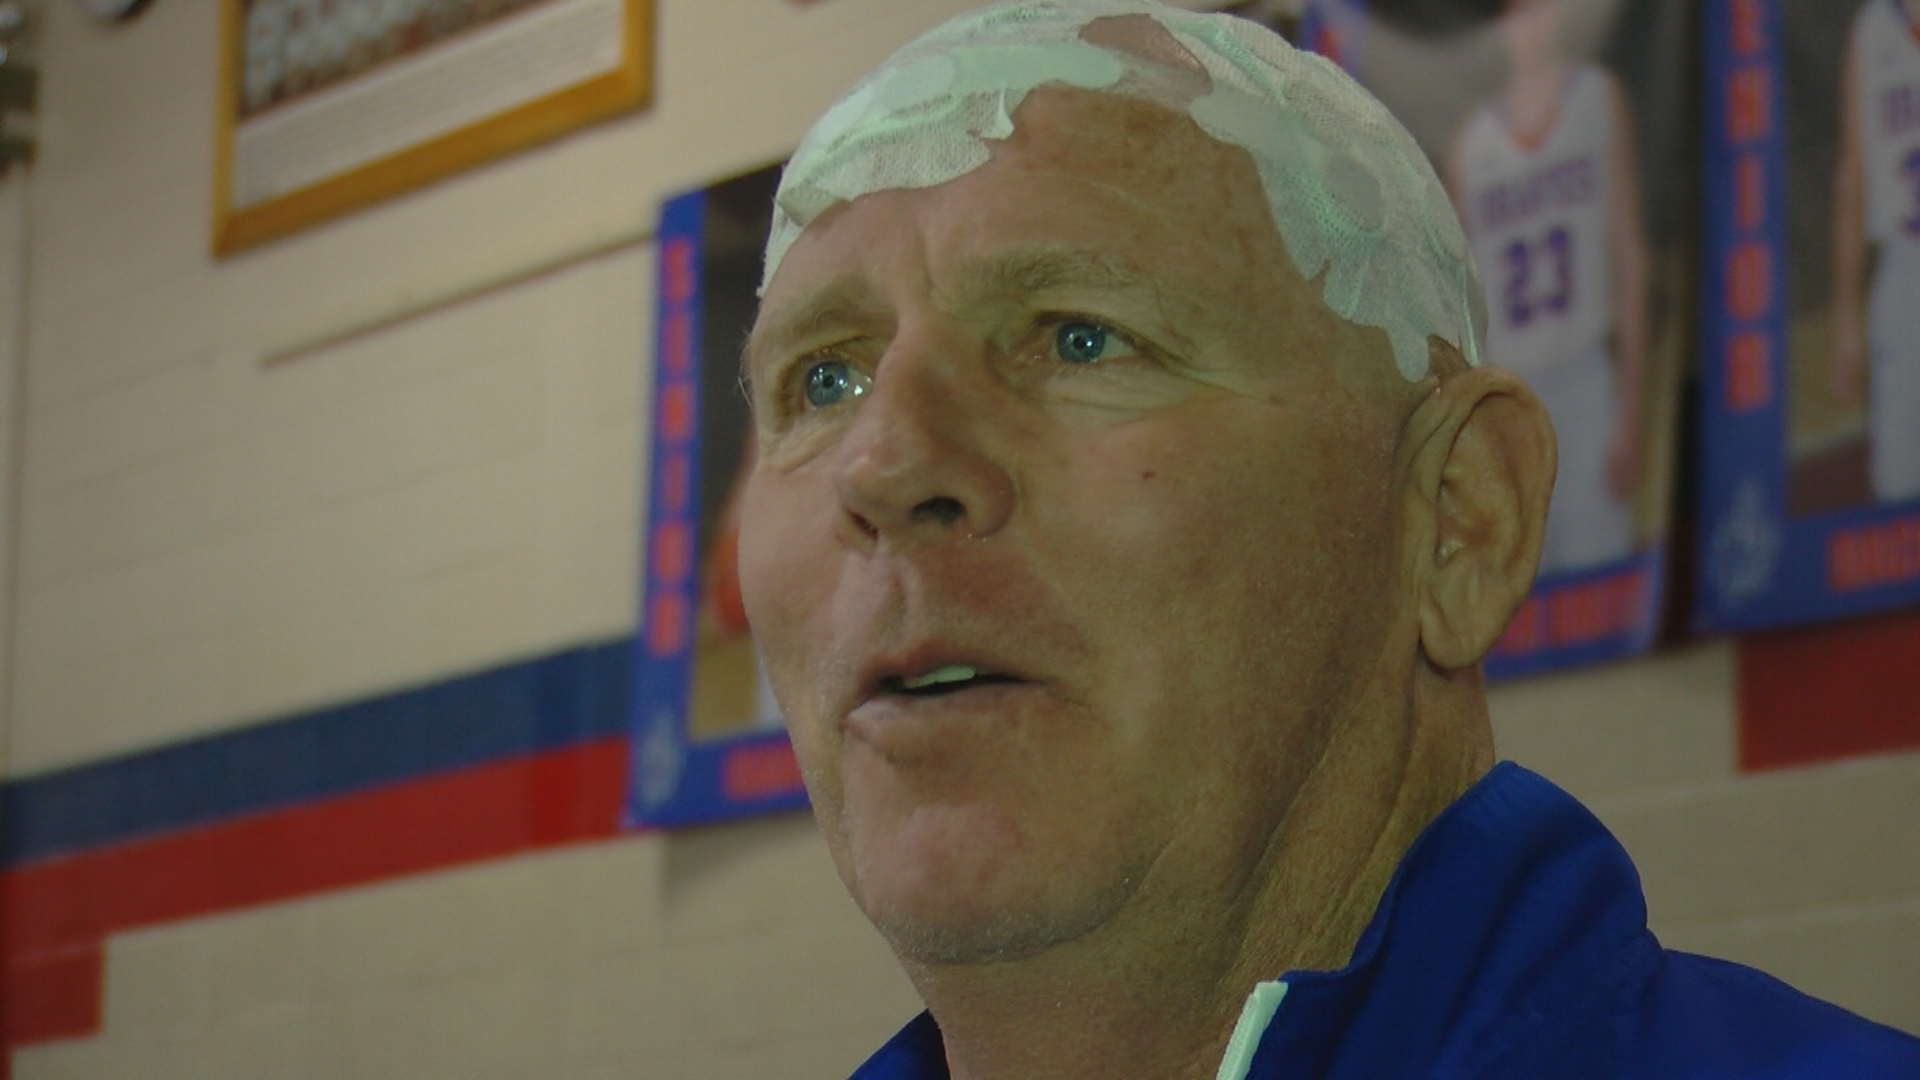 High school basketball coach defies cancer prognosis